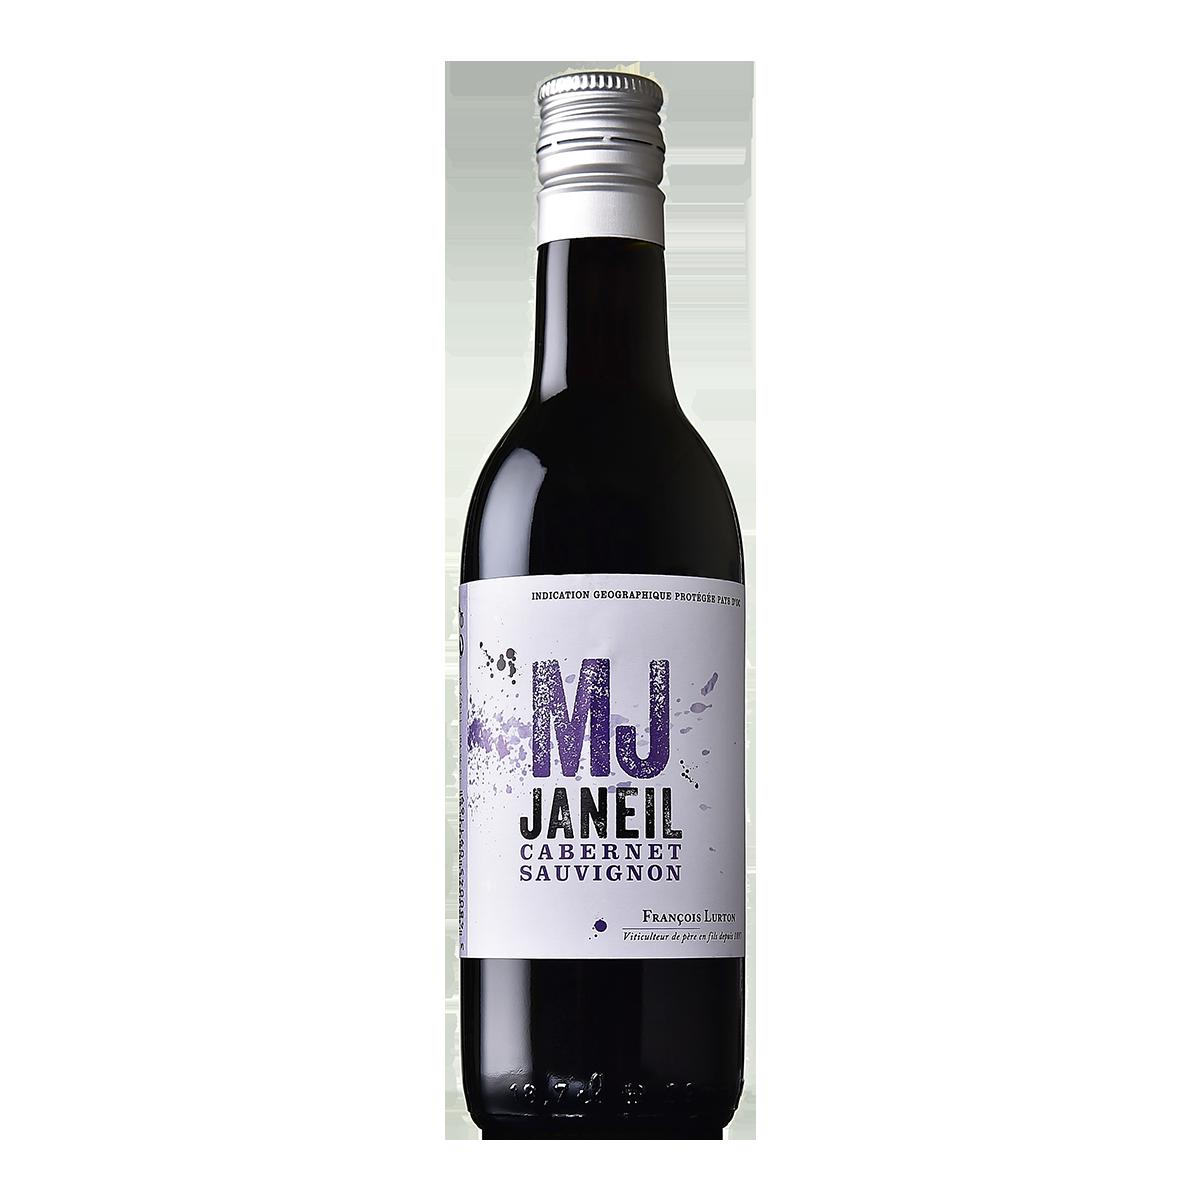 FRL1101Q 法國路得MJ卡本內蘇維濃紅酒 François Lurton MJ Janeil Cabernet Sauvignon Pays d'Oc I.G.P.(187ml)